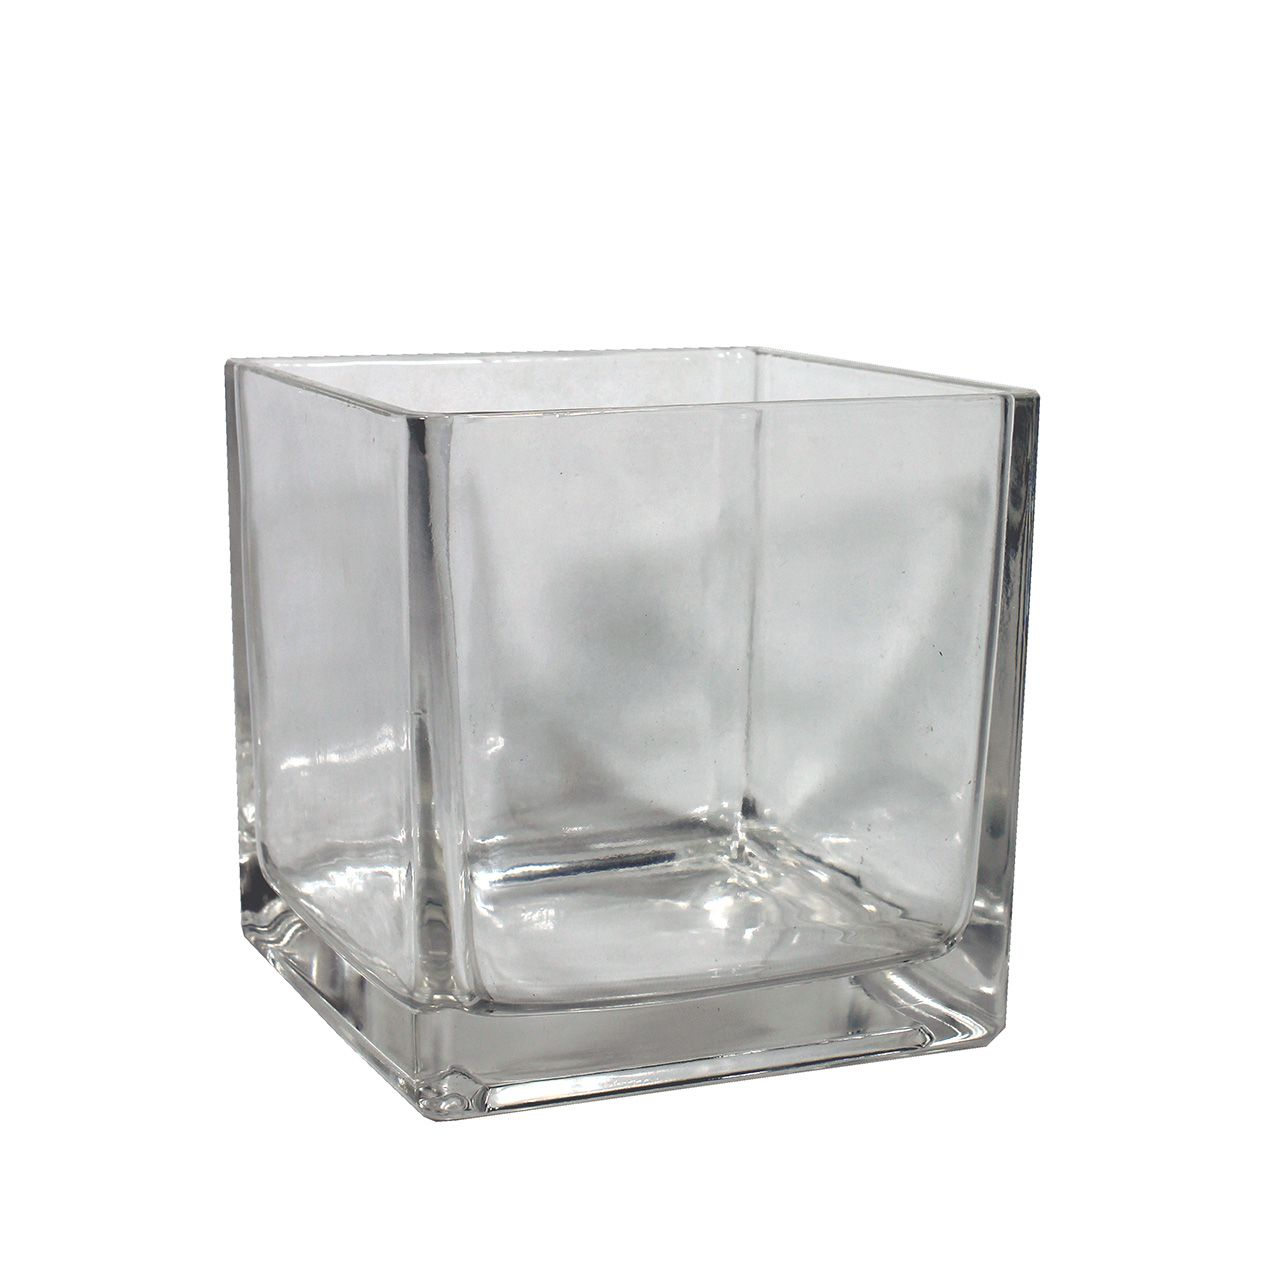 Vaso De Vidro Quadrado Grande - 18,30Cm Altura  X 16Cm Boca